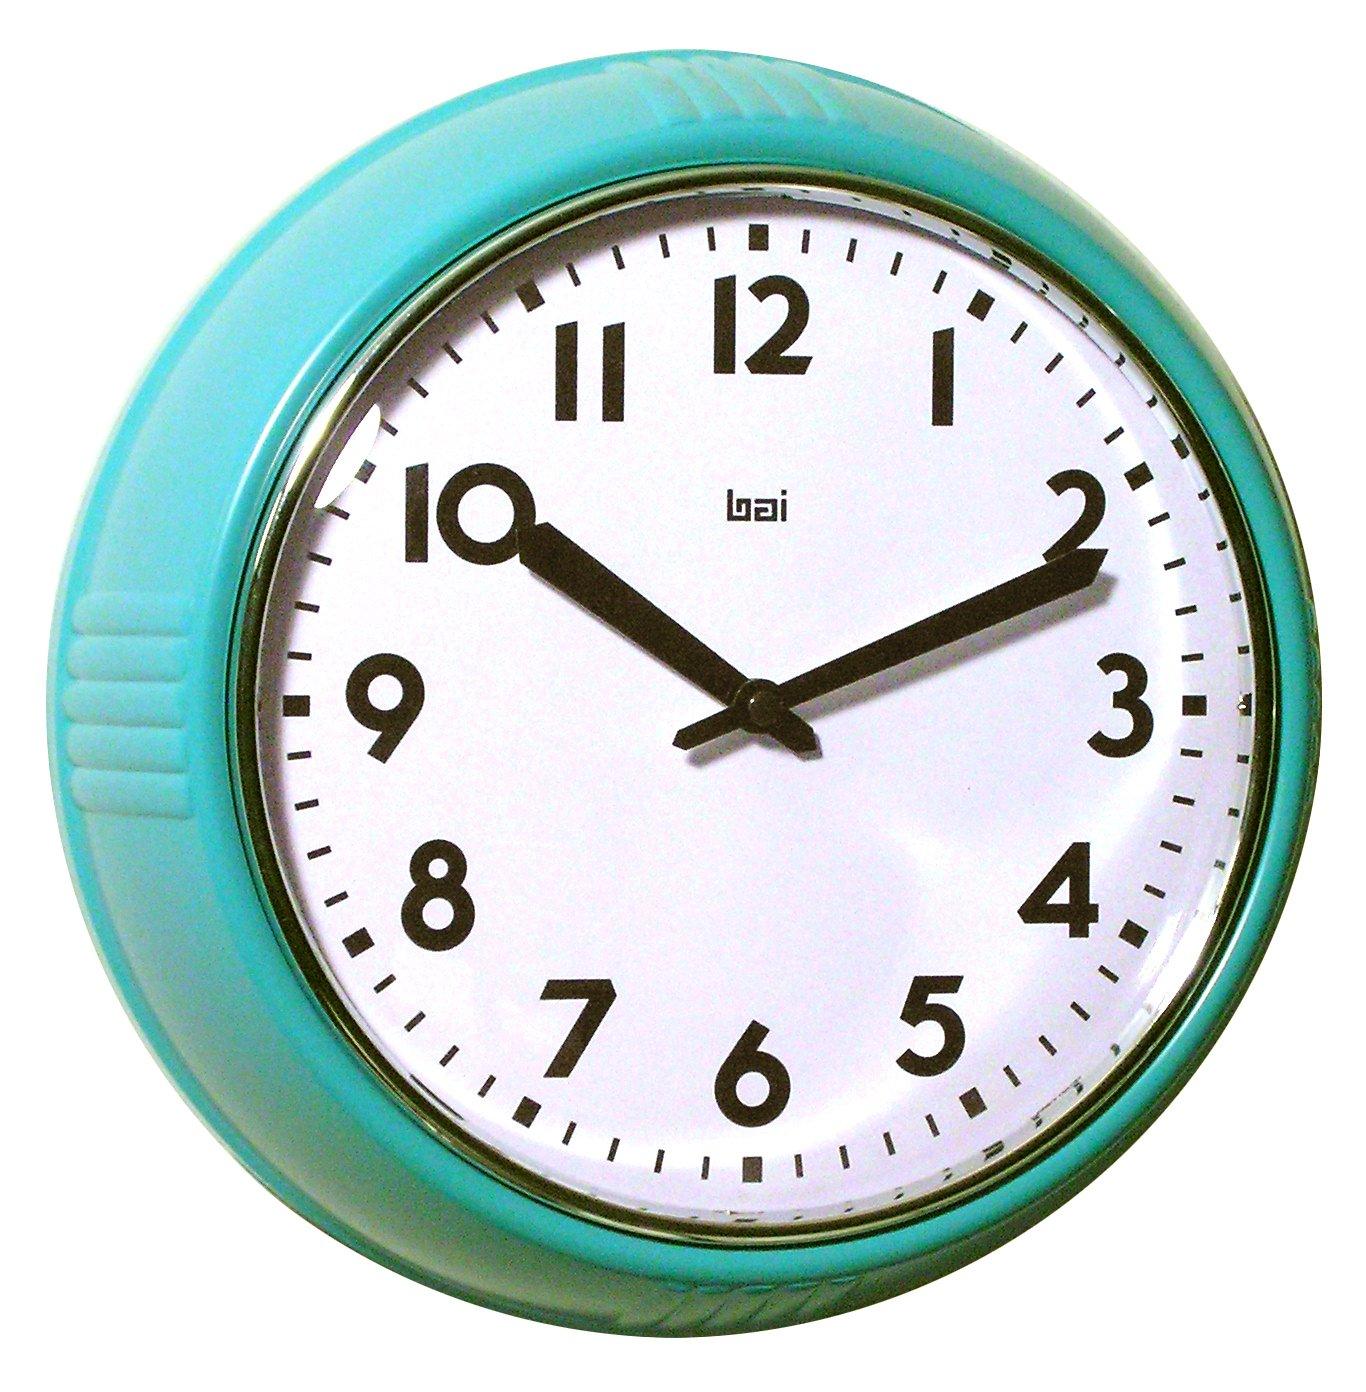 Bai School Wall Clock, Turquoise